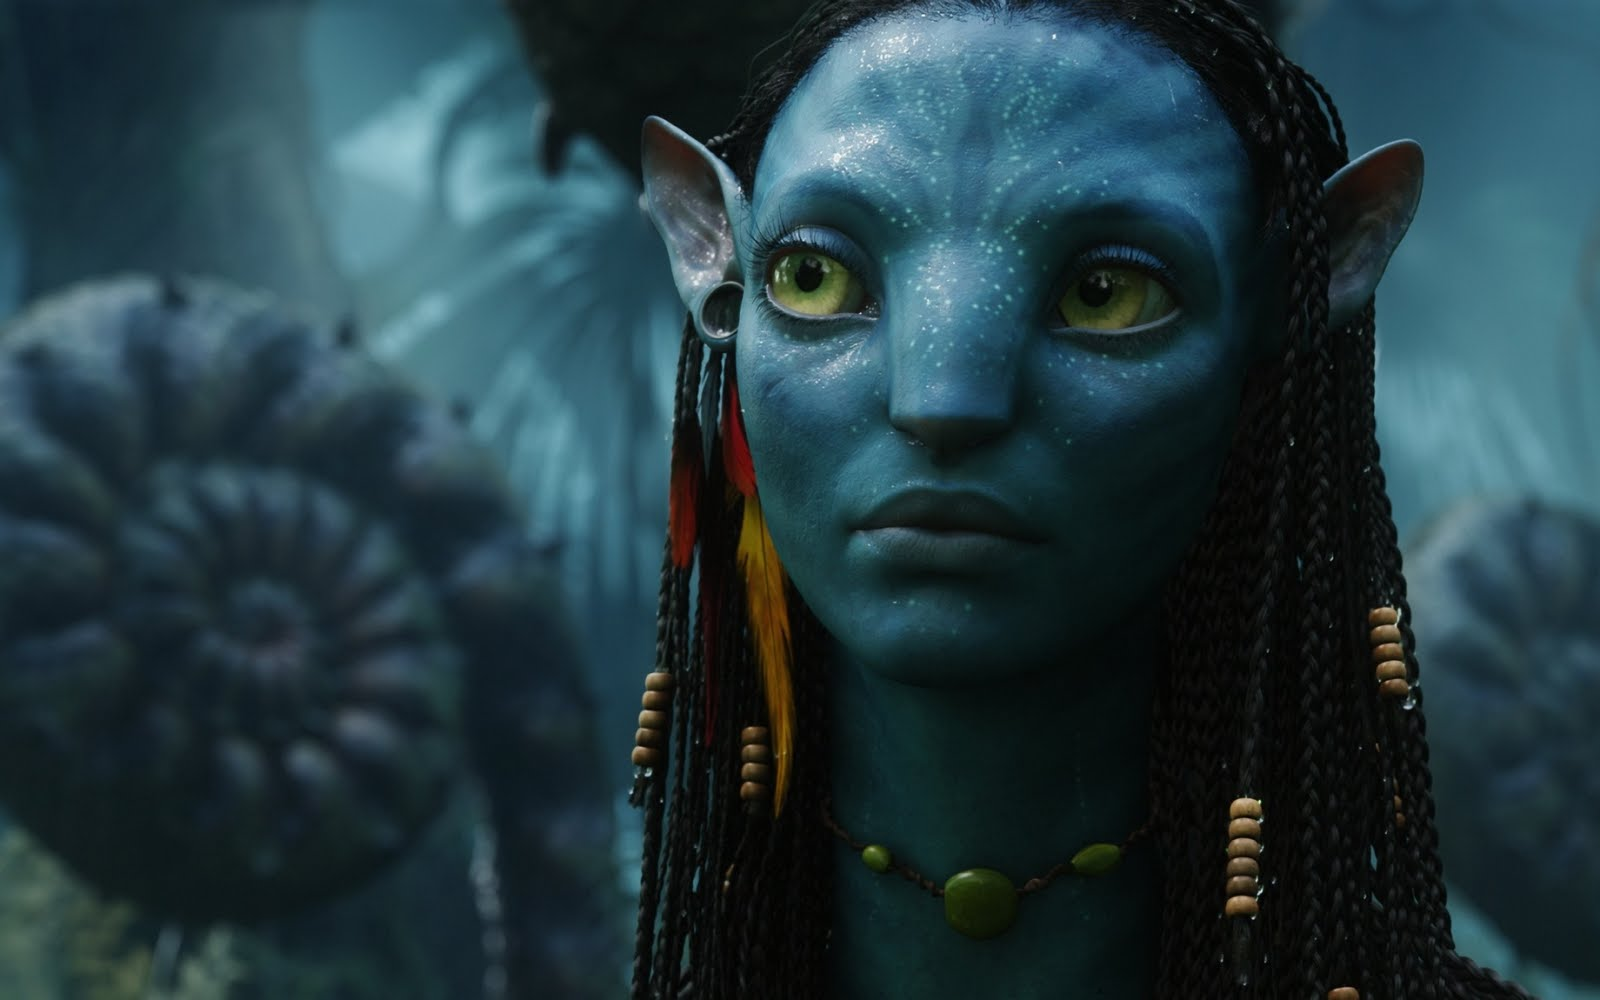 zoe saldana as neytiri in avatar wallpapers - Gallery Neytiri Avatar Wiki Wikia